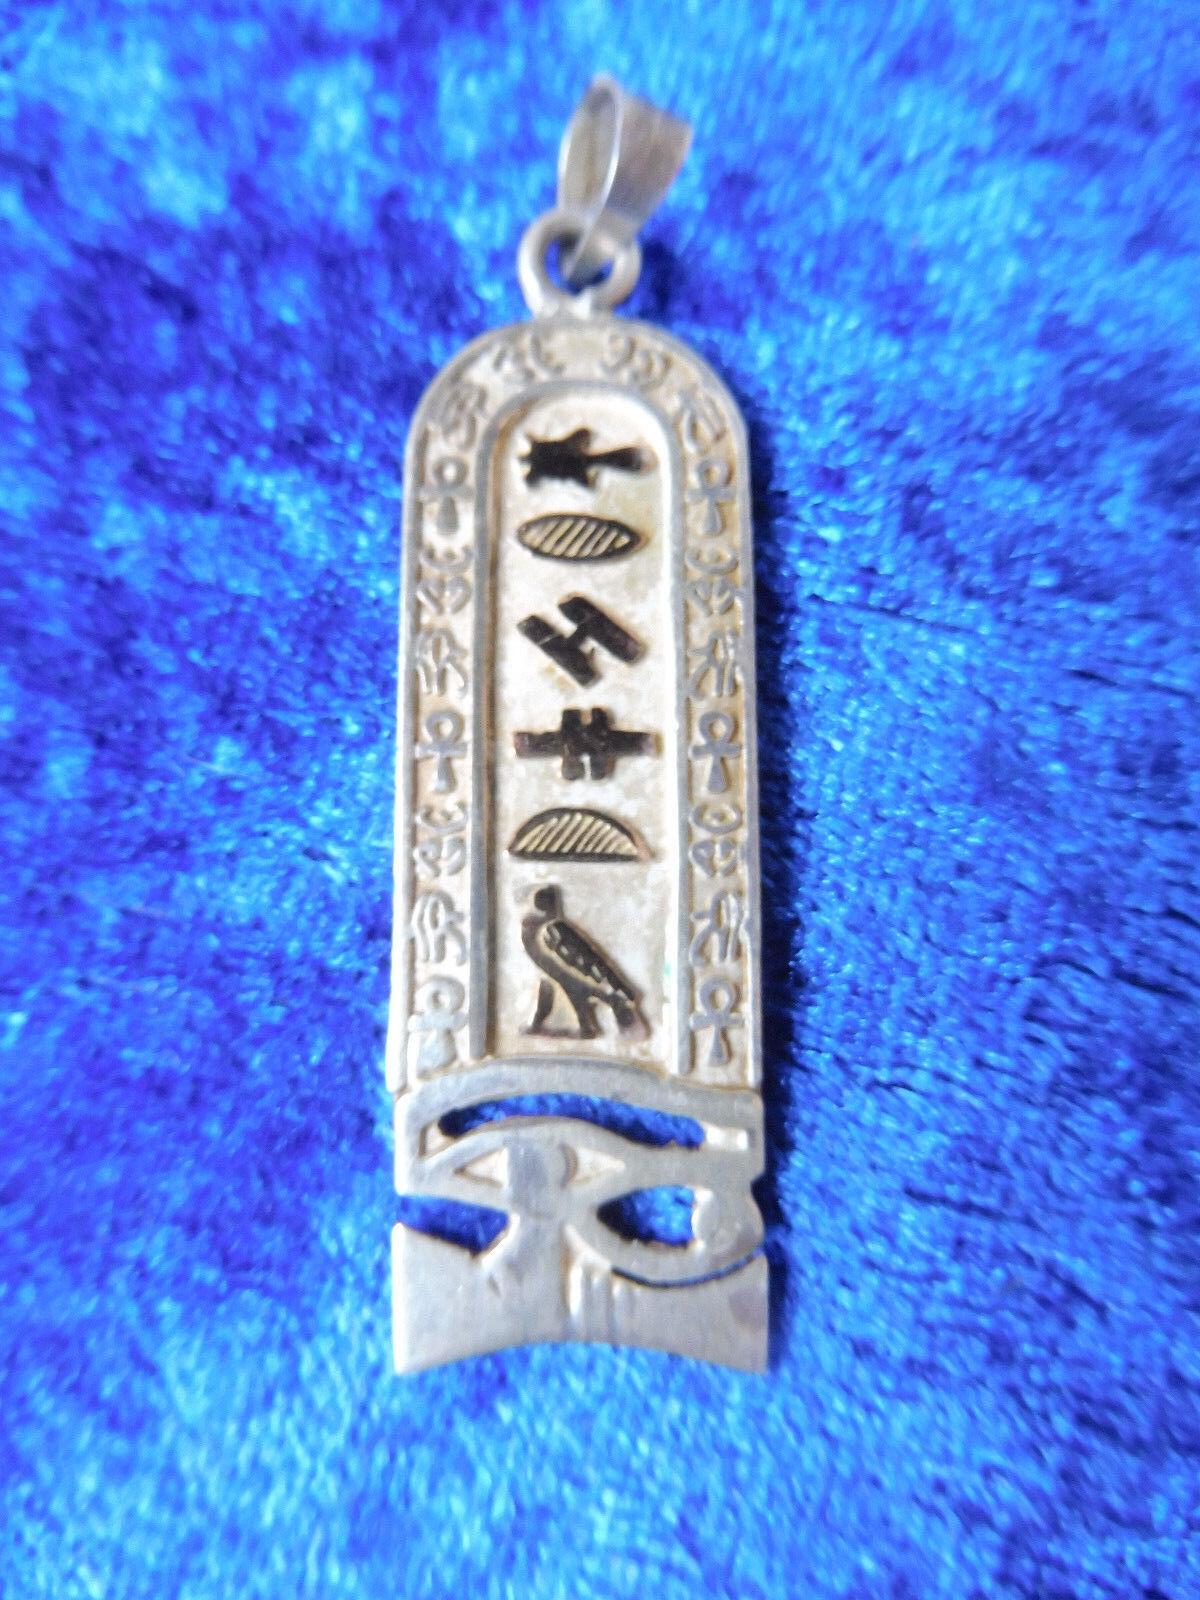 Schöner Anhänger__Kettenanhänger__925 silver und redgold__5cm__Ägypten_